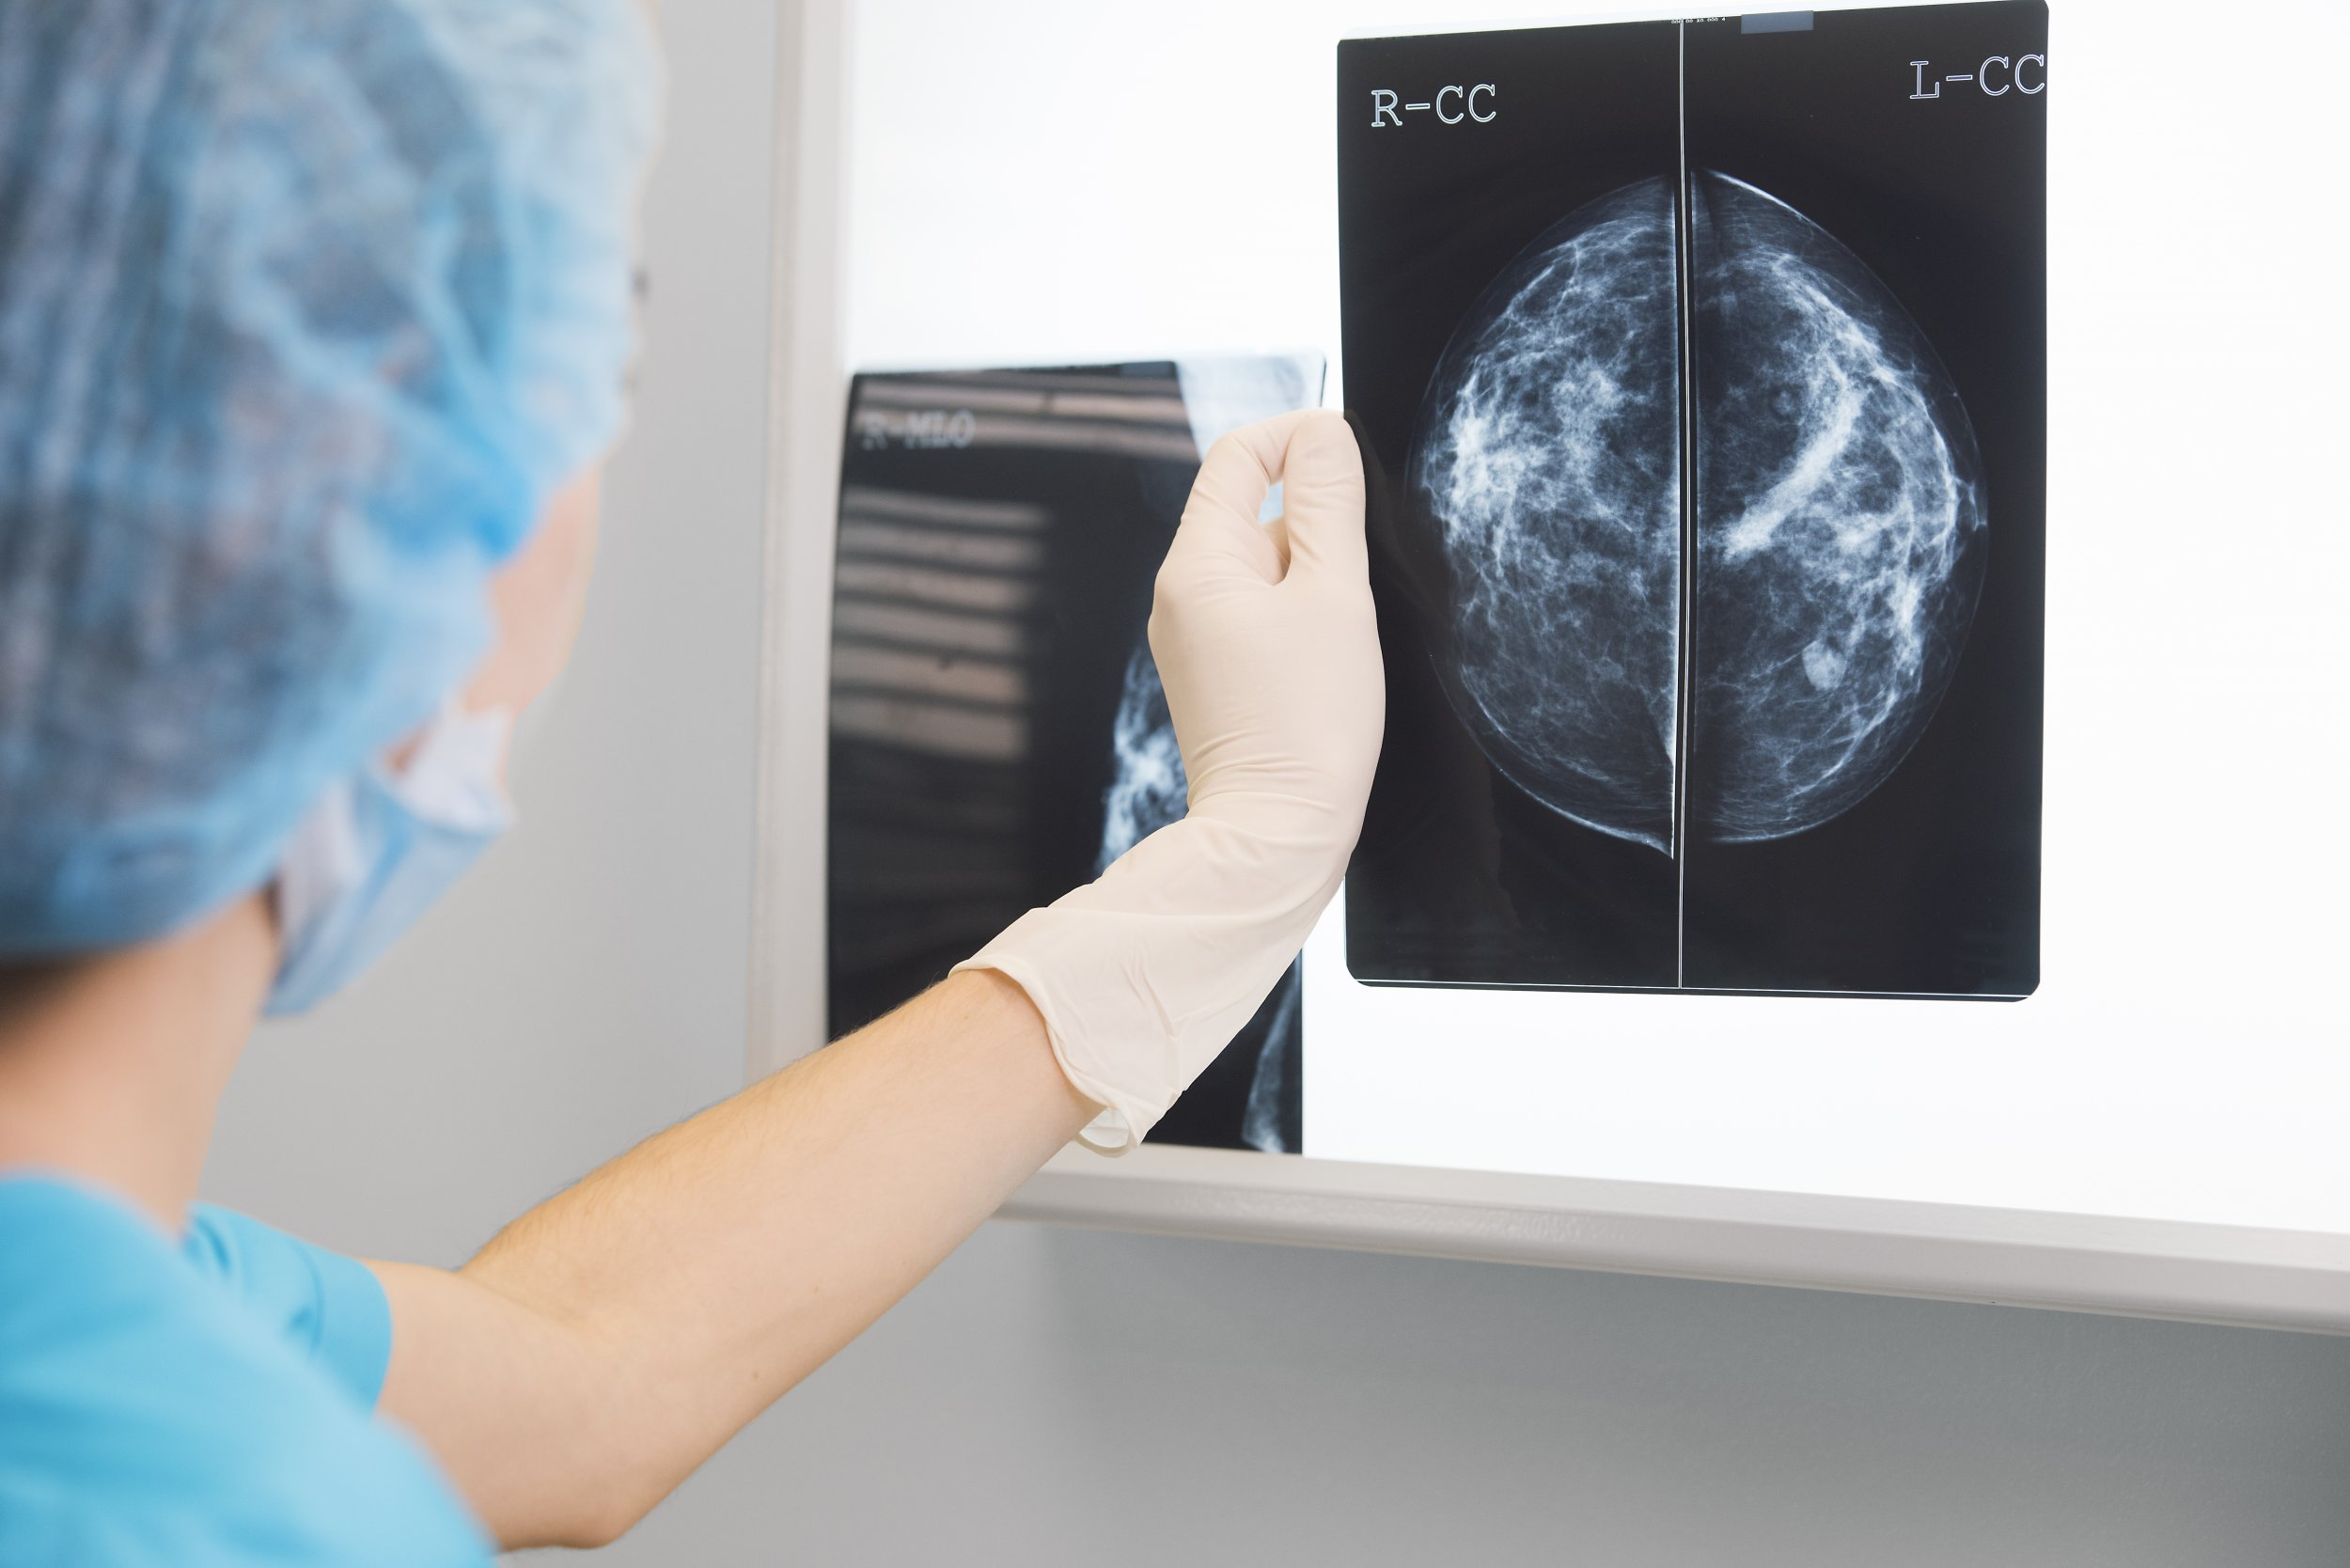 breast-cancer-xray-stock